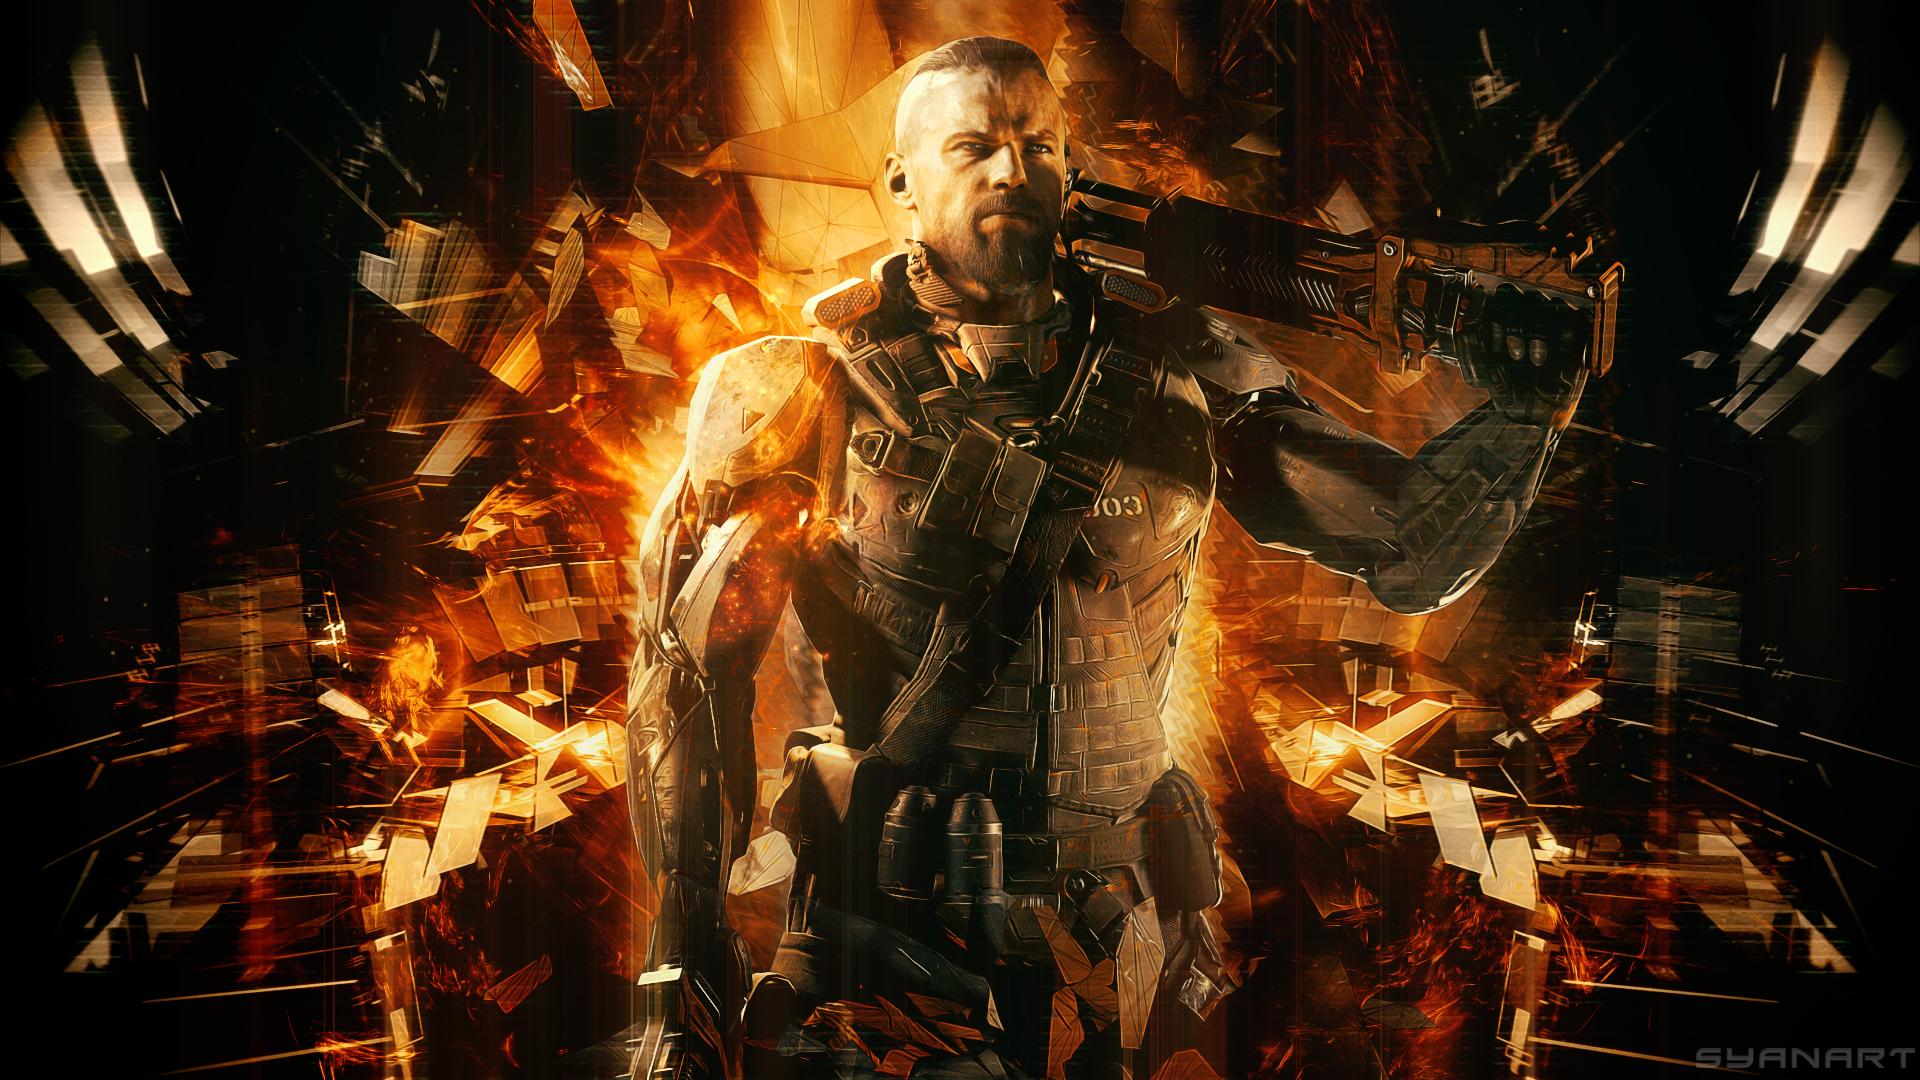 Free Download Call Of Duty Black Ops 3 Full Hd Wallpaper Syanart